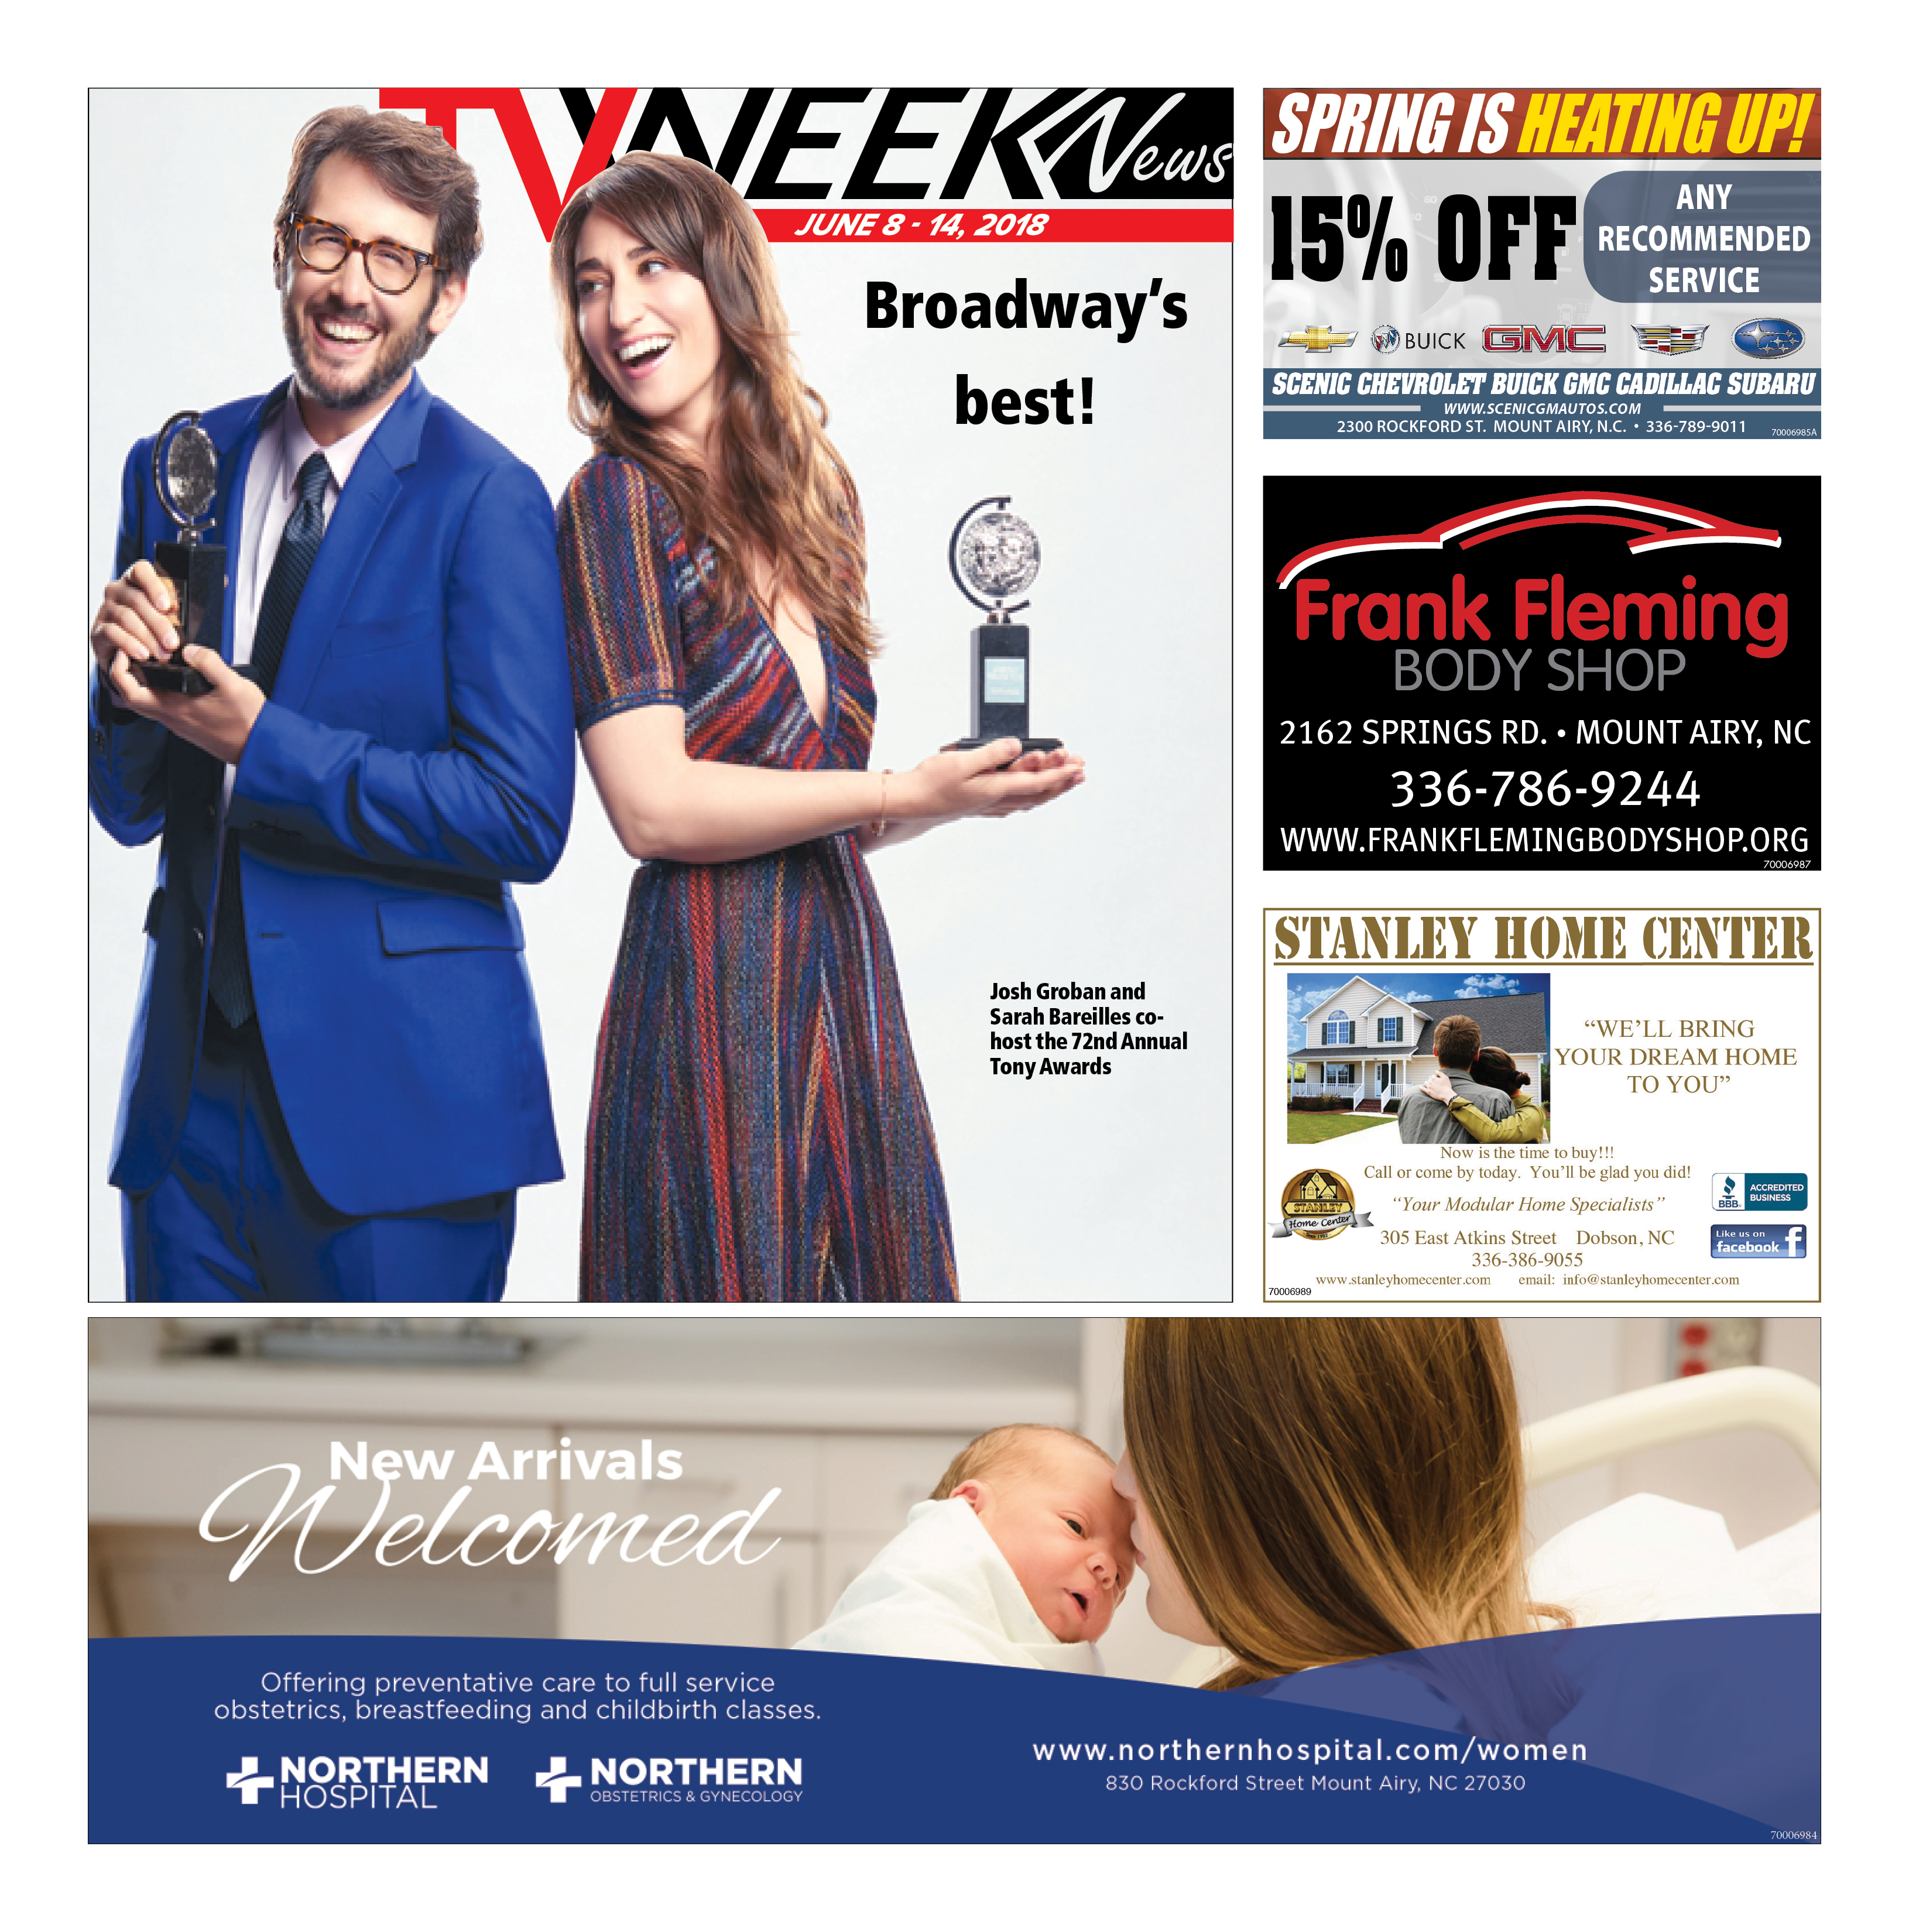 TV WEEK News June 8 – 14, 2018